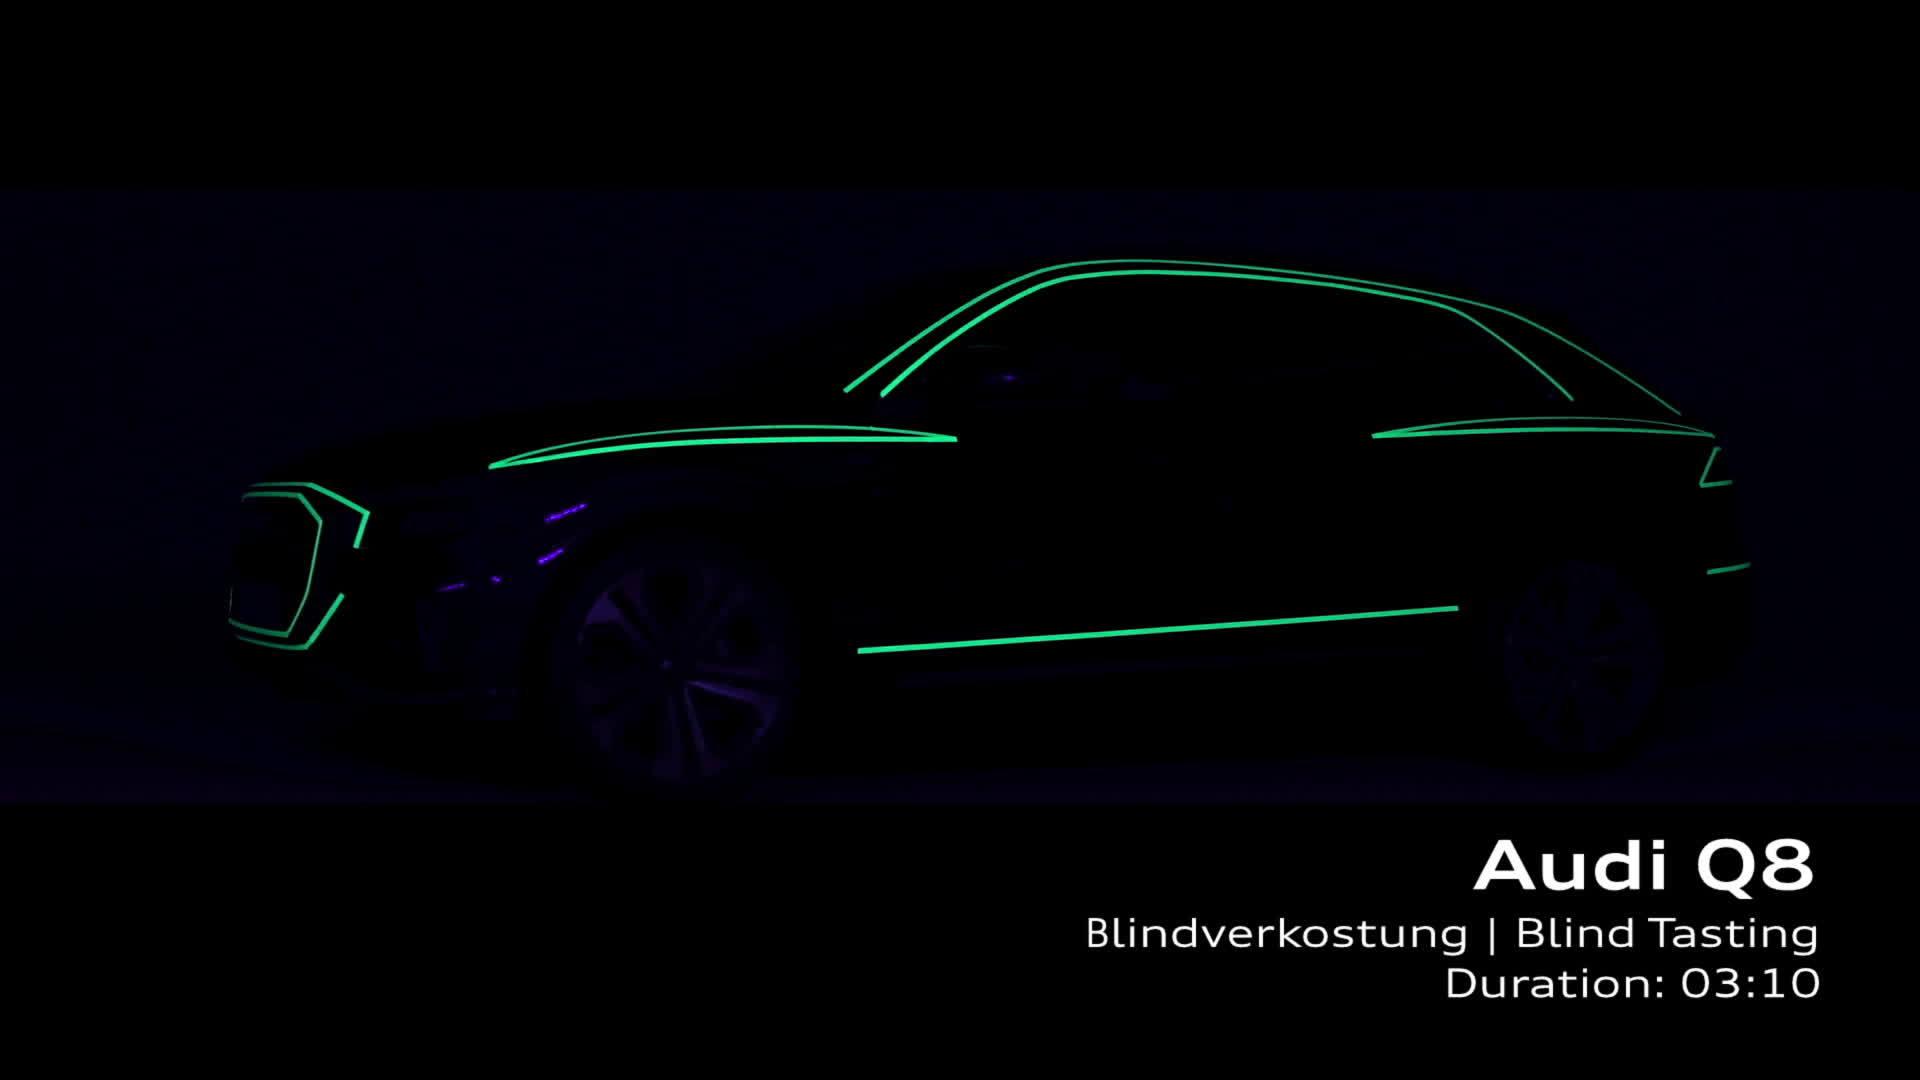 Footage Audi Q8 Blindverkostung